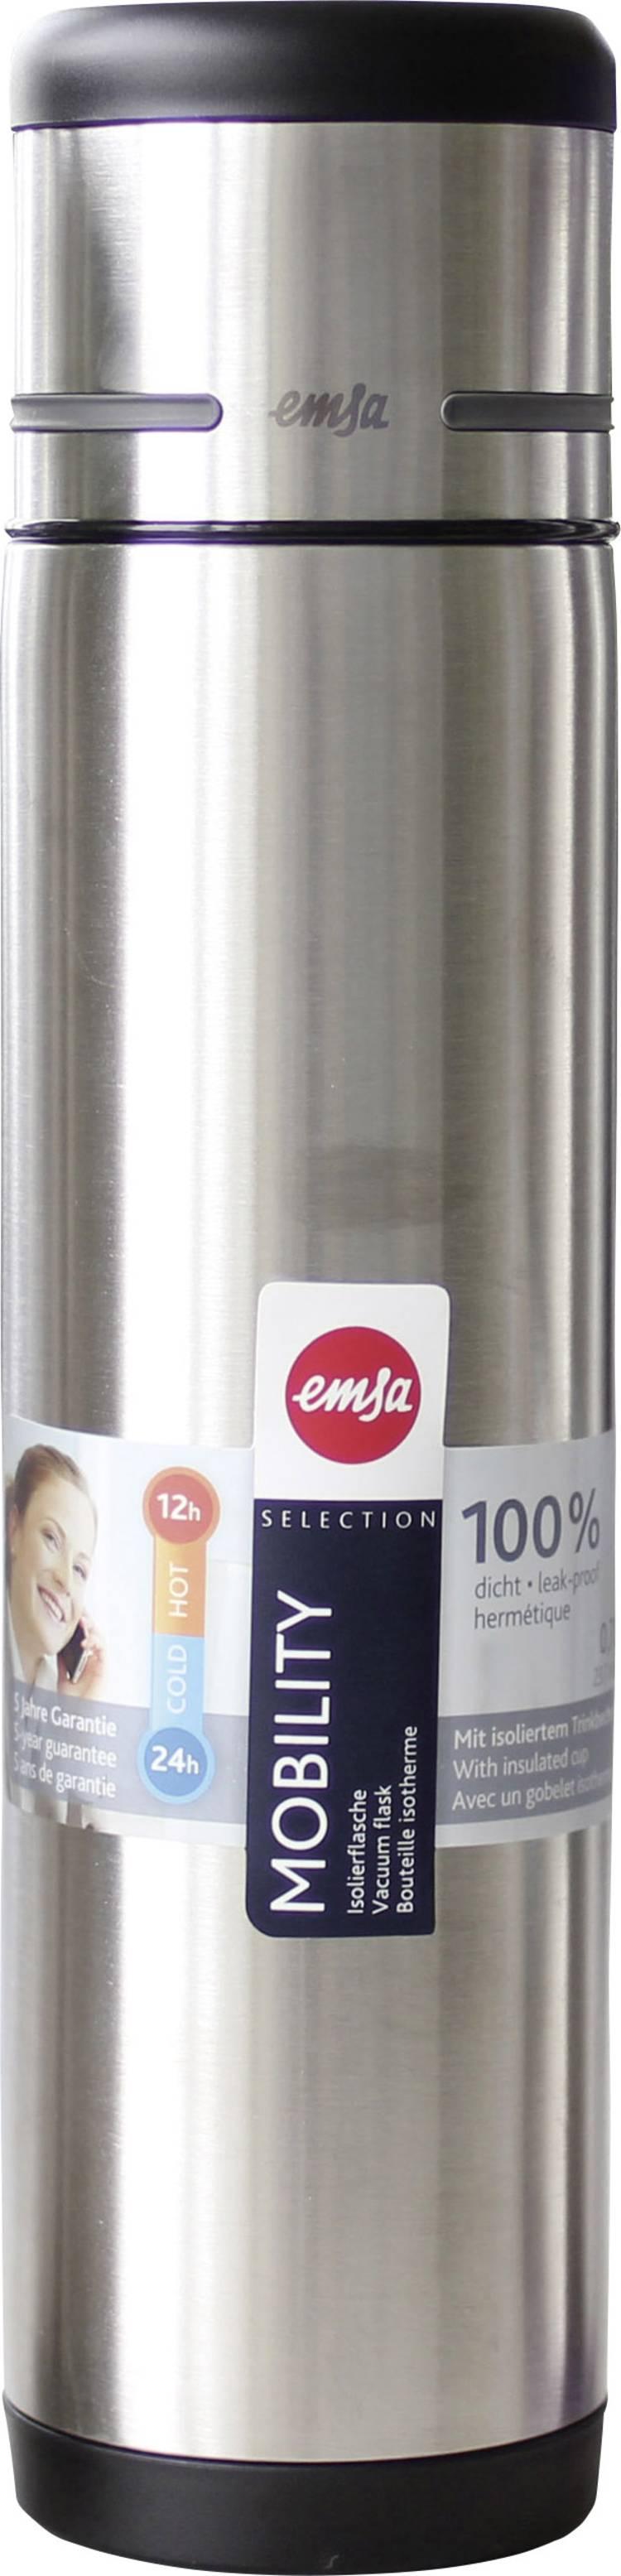 Image of Emsa-thermosfles Mobility, 0,7 liter, zwart